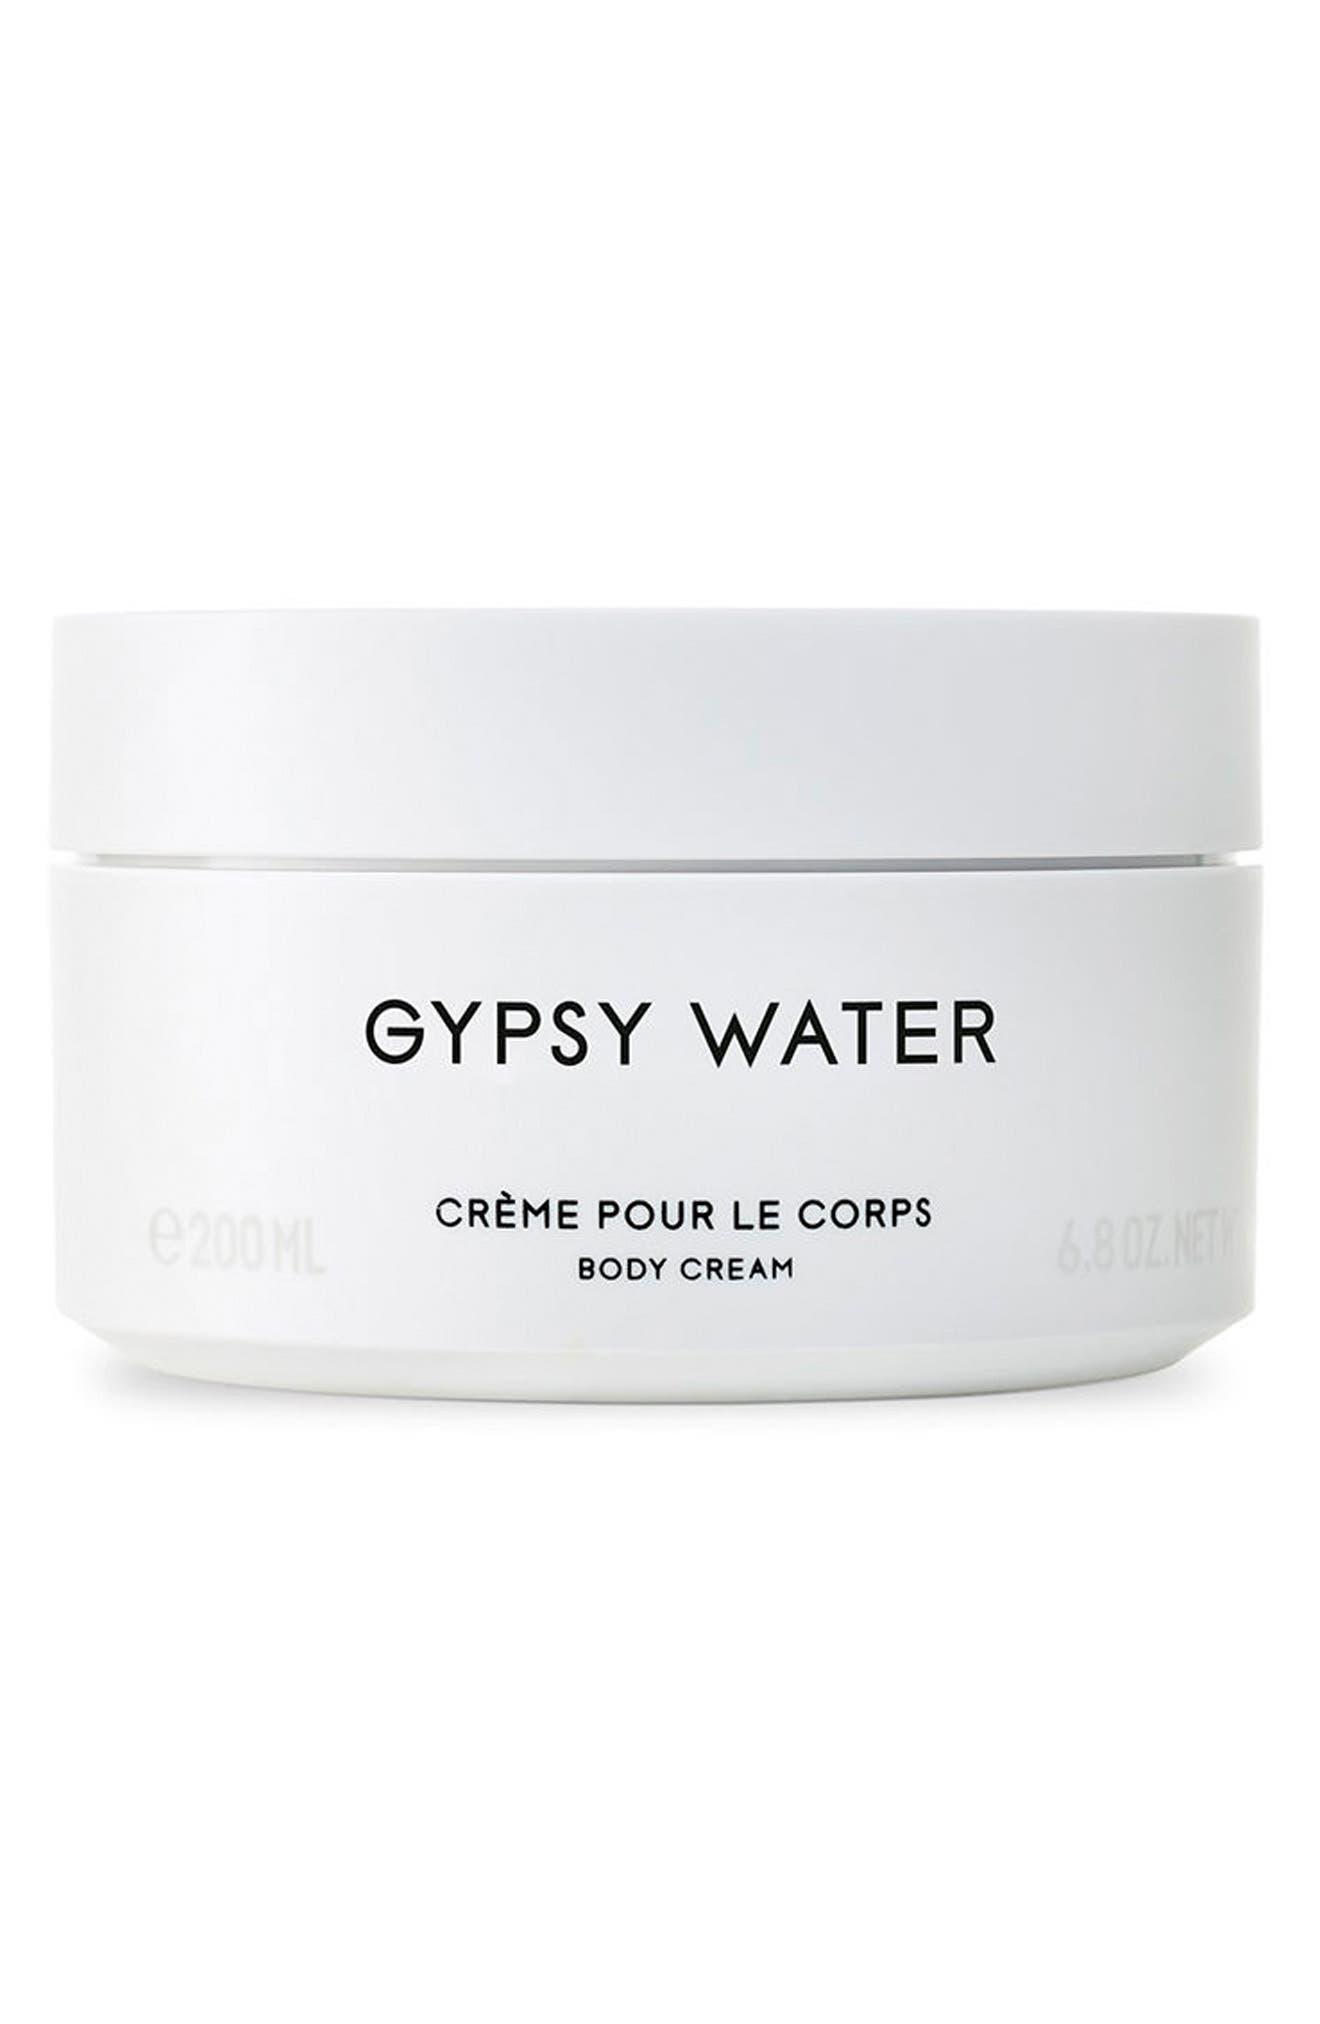 Gypsy Water Body Cream,                             Main thumbnail 1, color,                             No Color